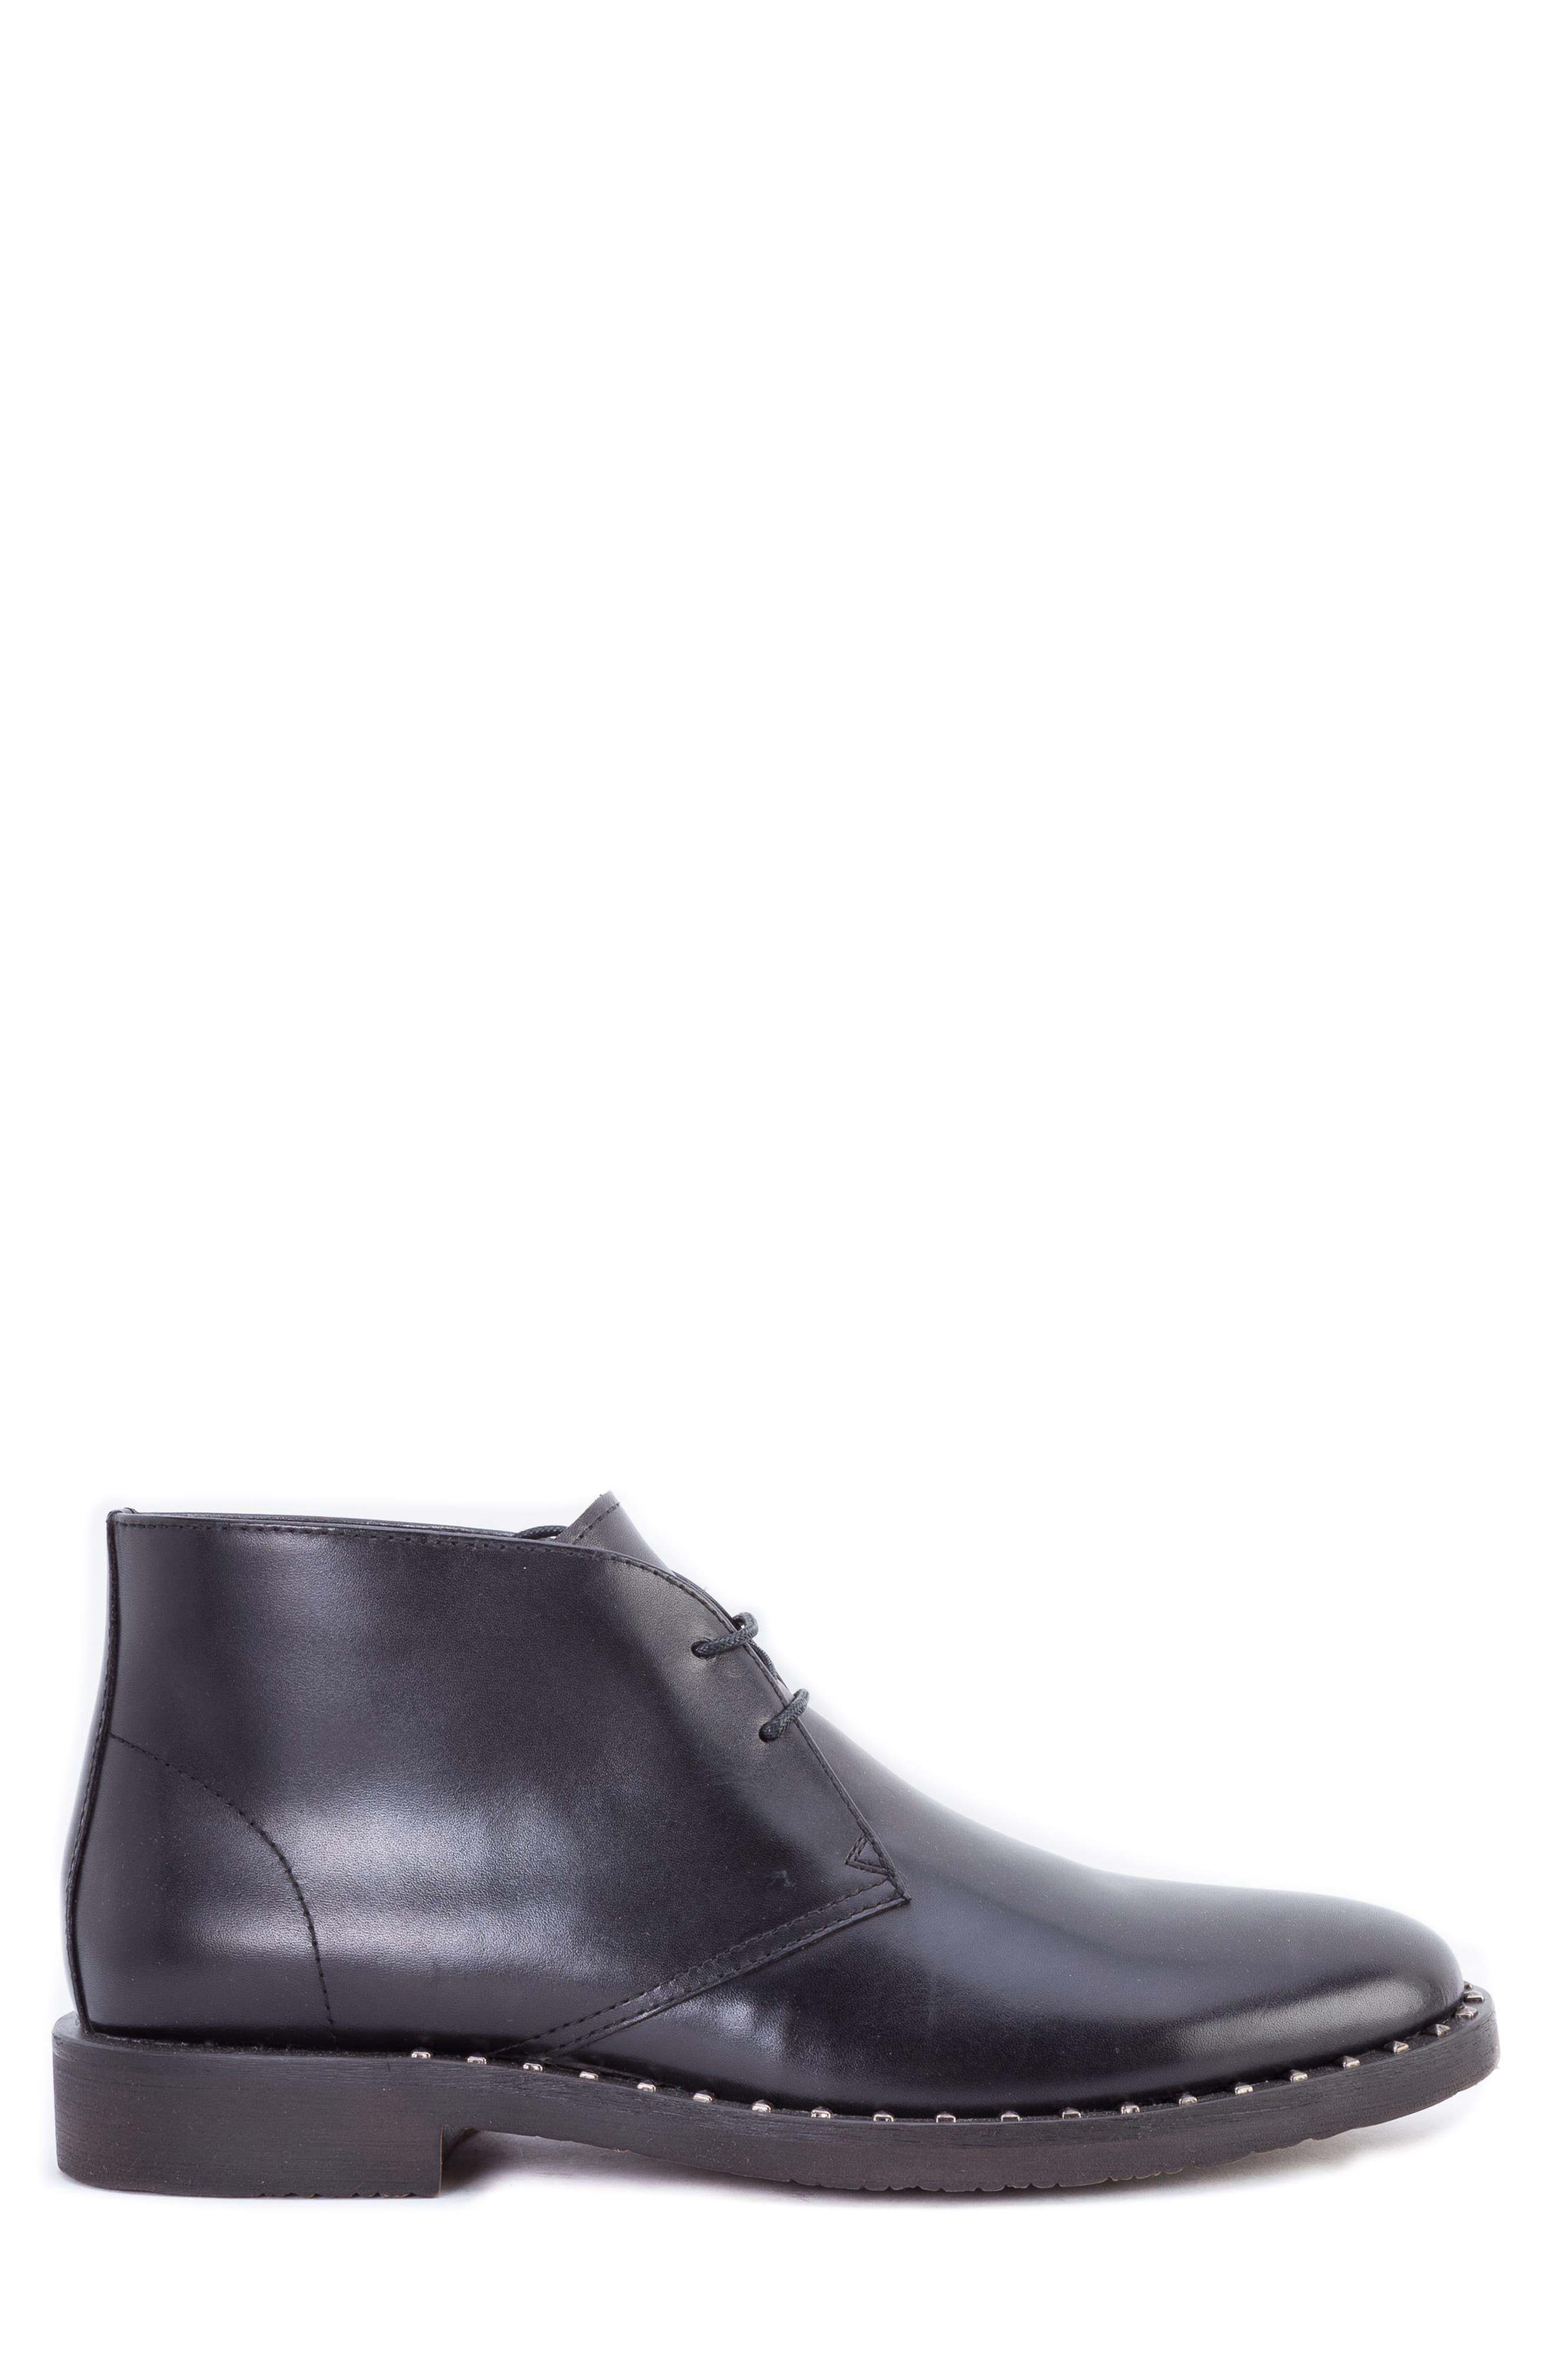 Norrie Studded Chukka Boot,                             Alternate thumbnail 3, color,                             BLACK LEATHER